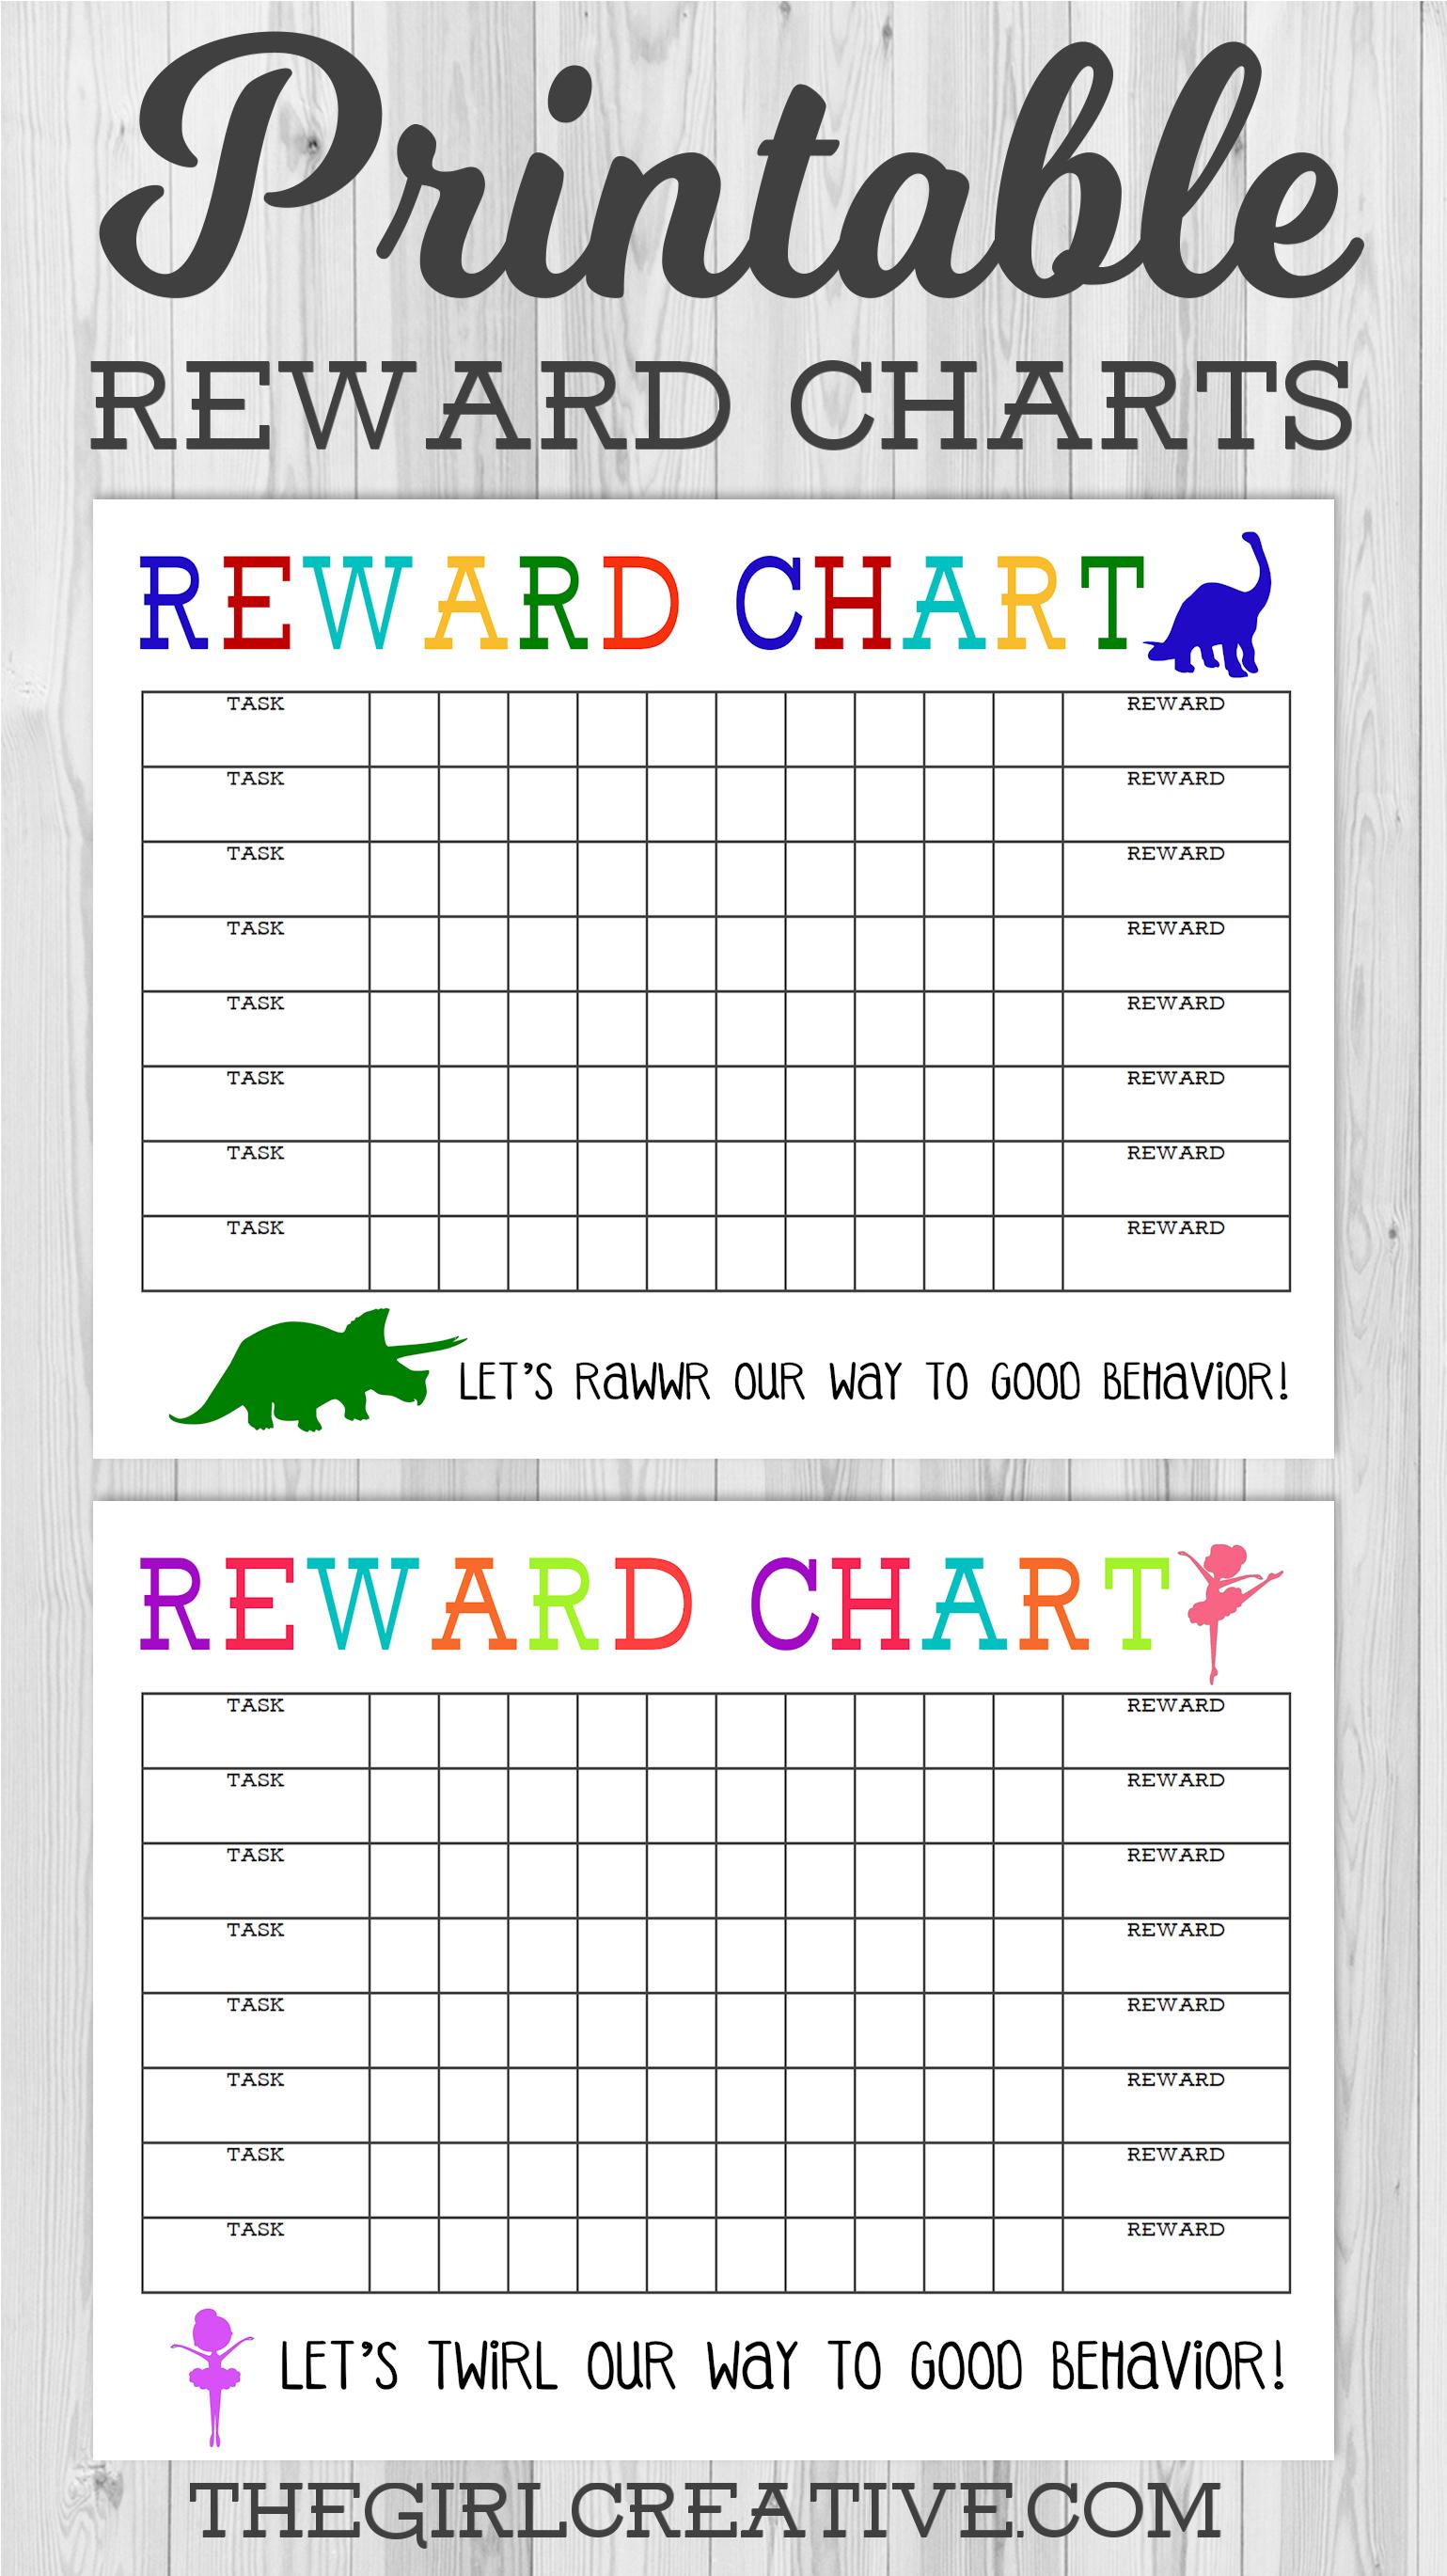 Printable Reward Chart  Printable Reward Charts Free Printable